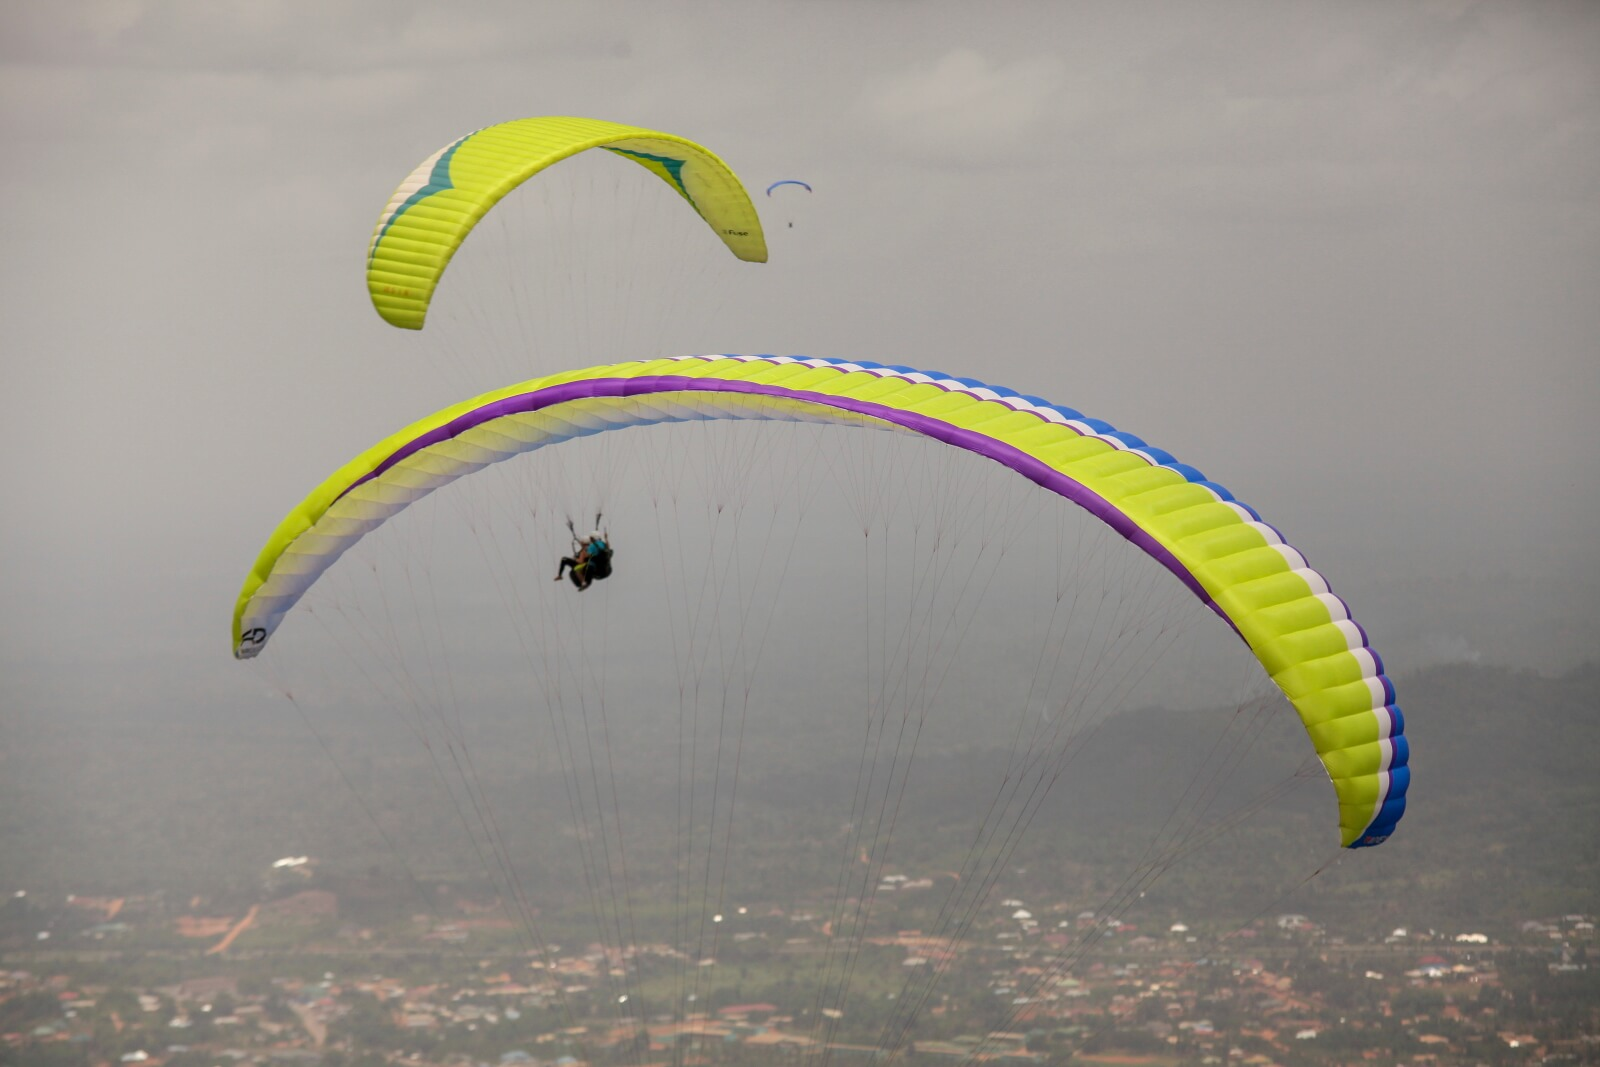 Paralotnictwo w Ghanie fot. EPA/CHRISTIAN THOMPSON